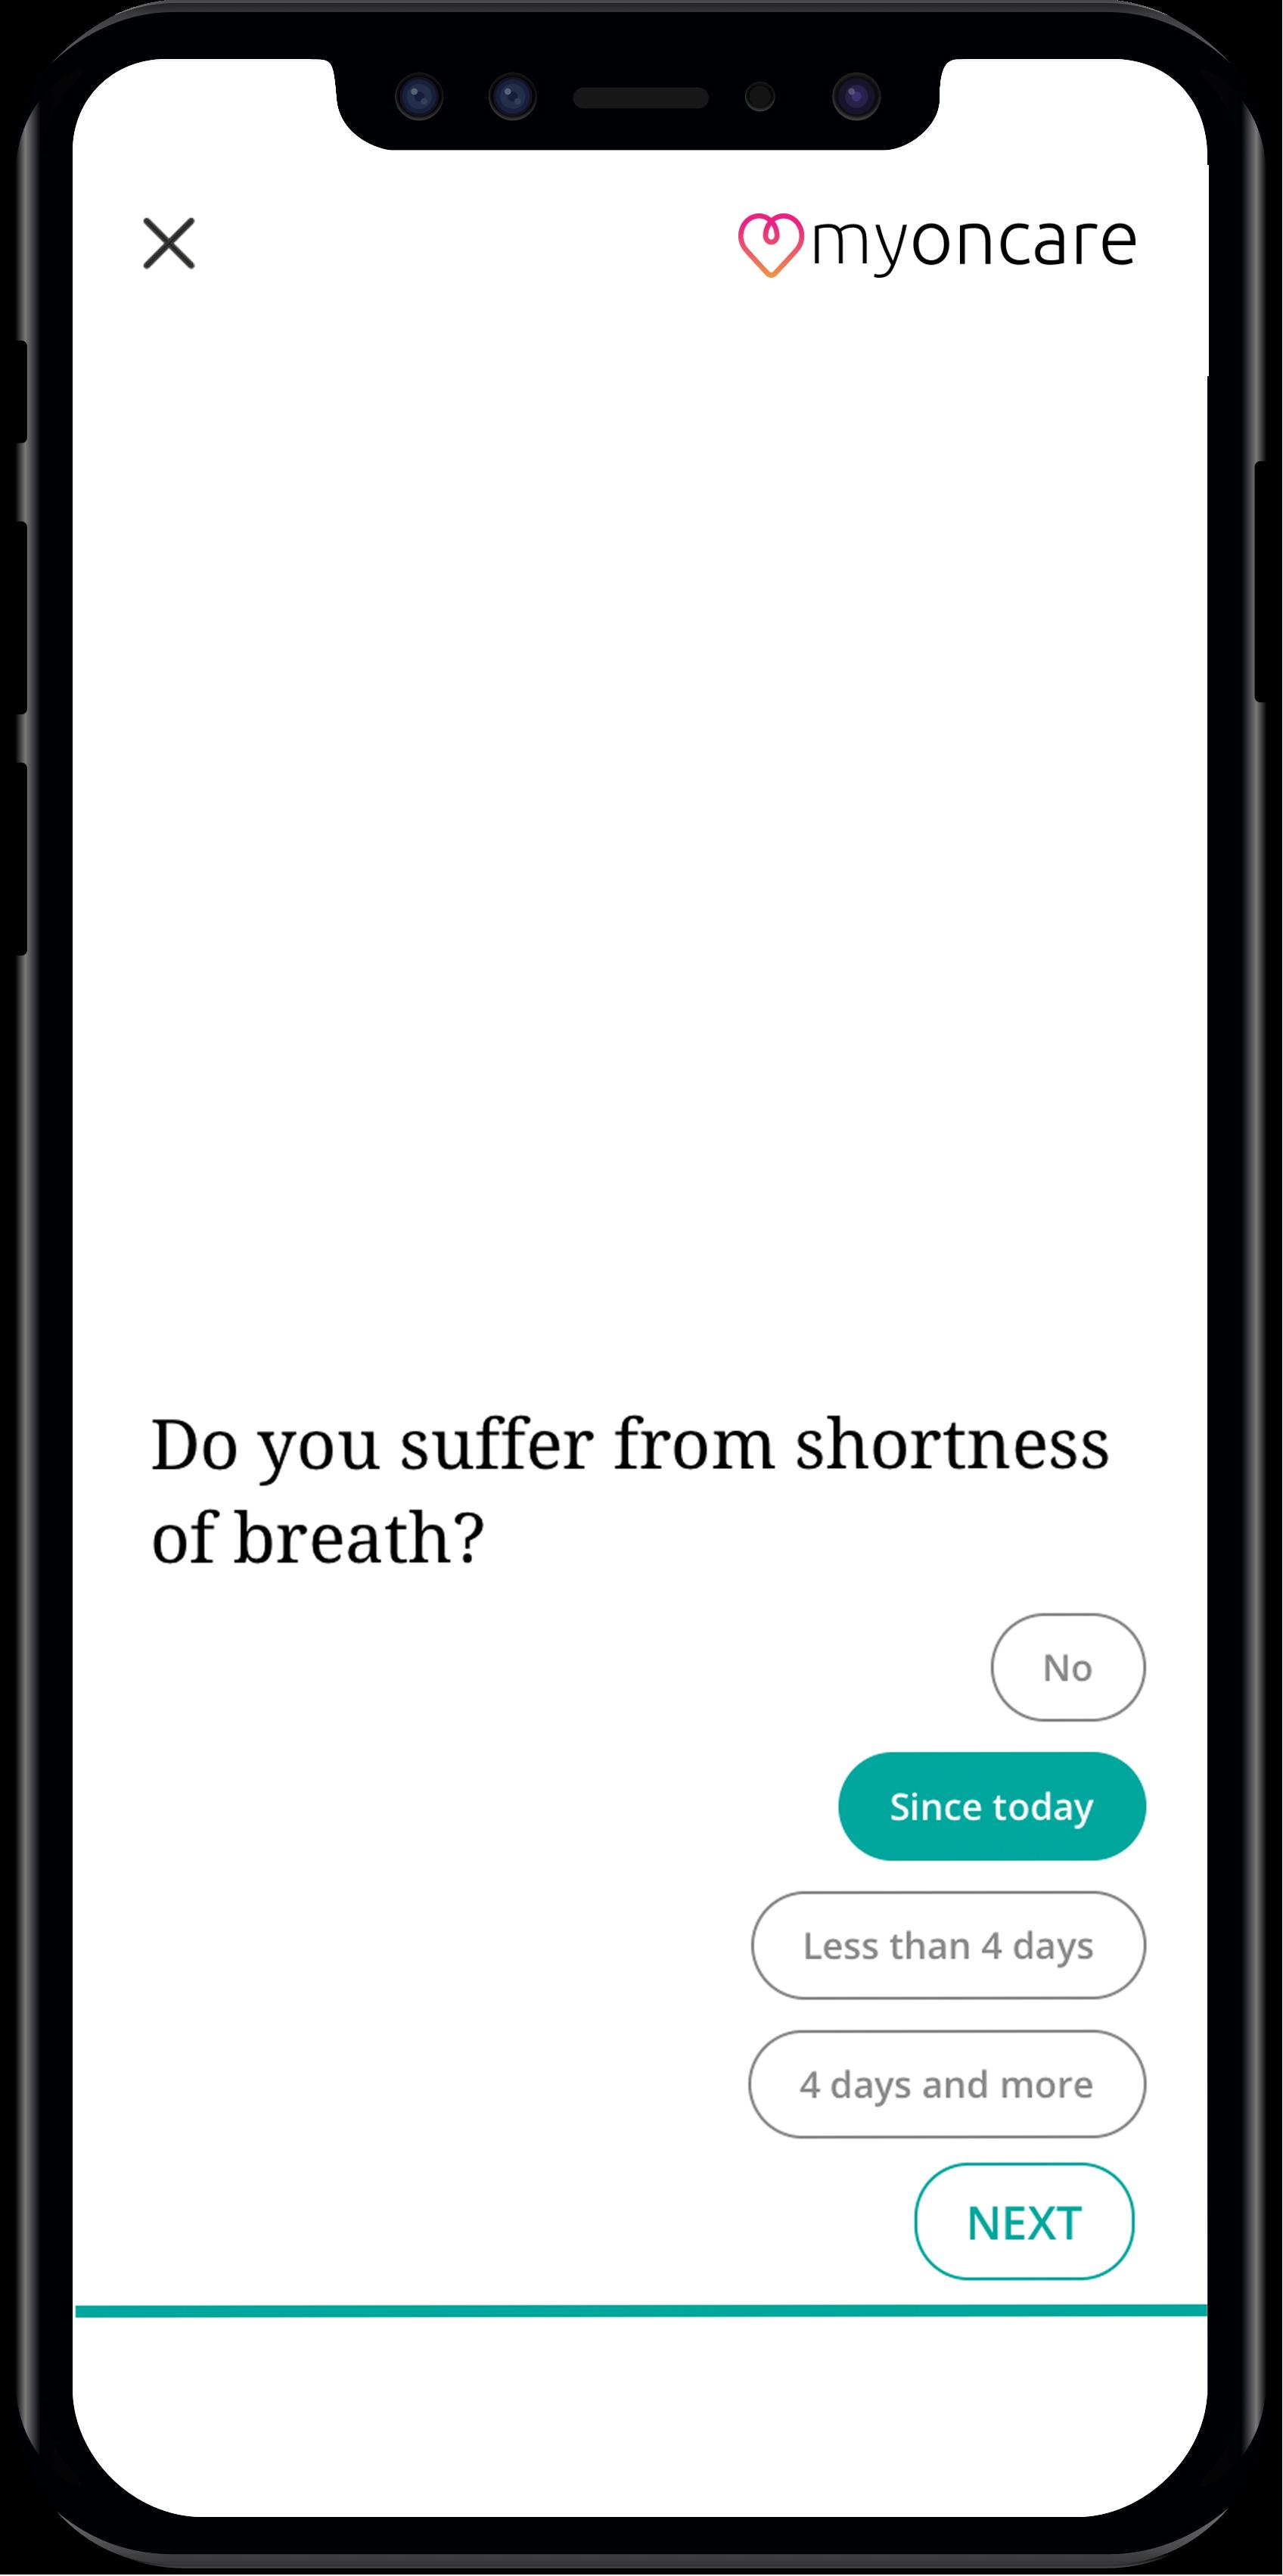 app view in app store